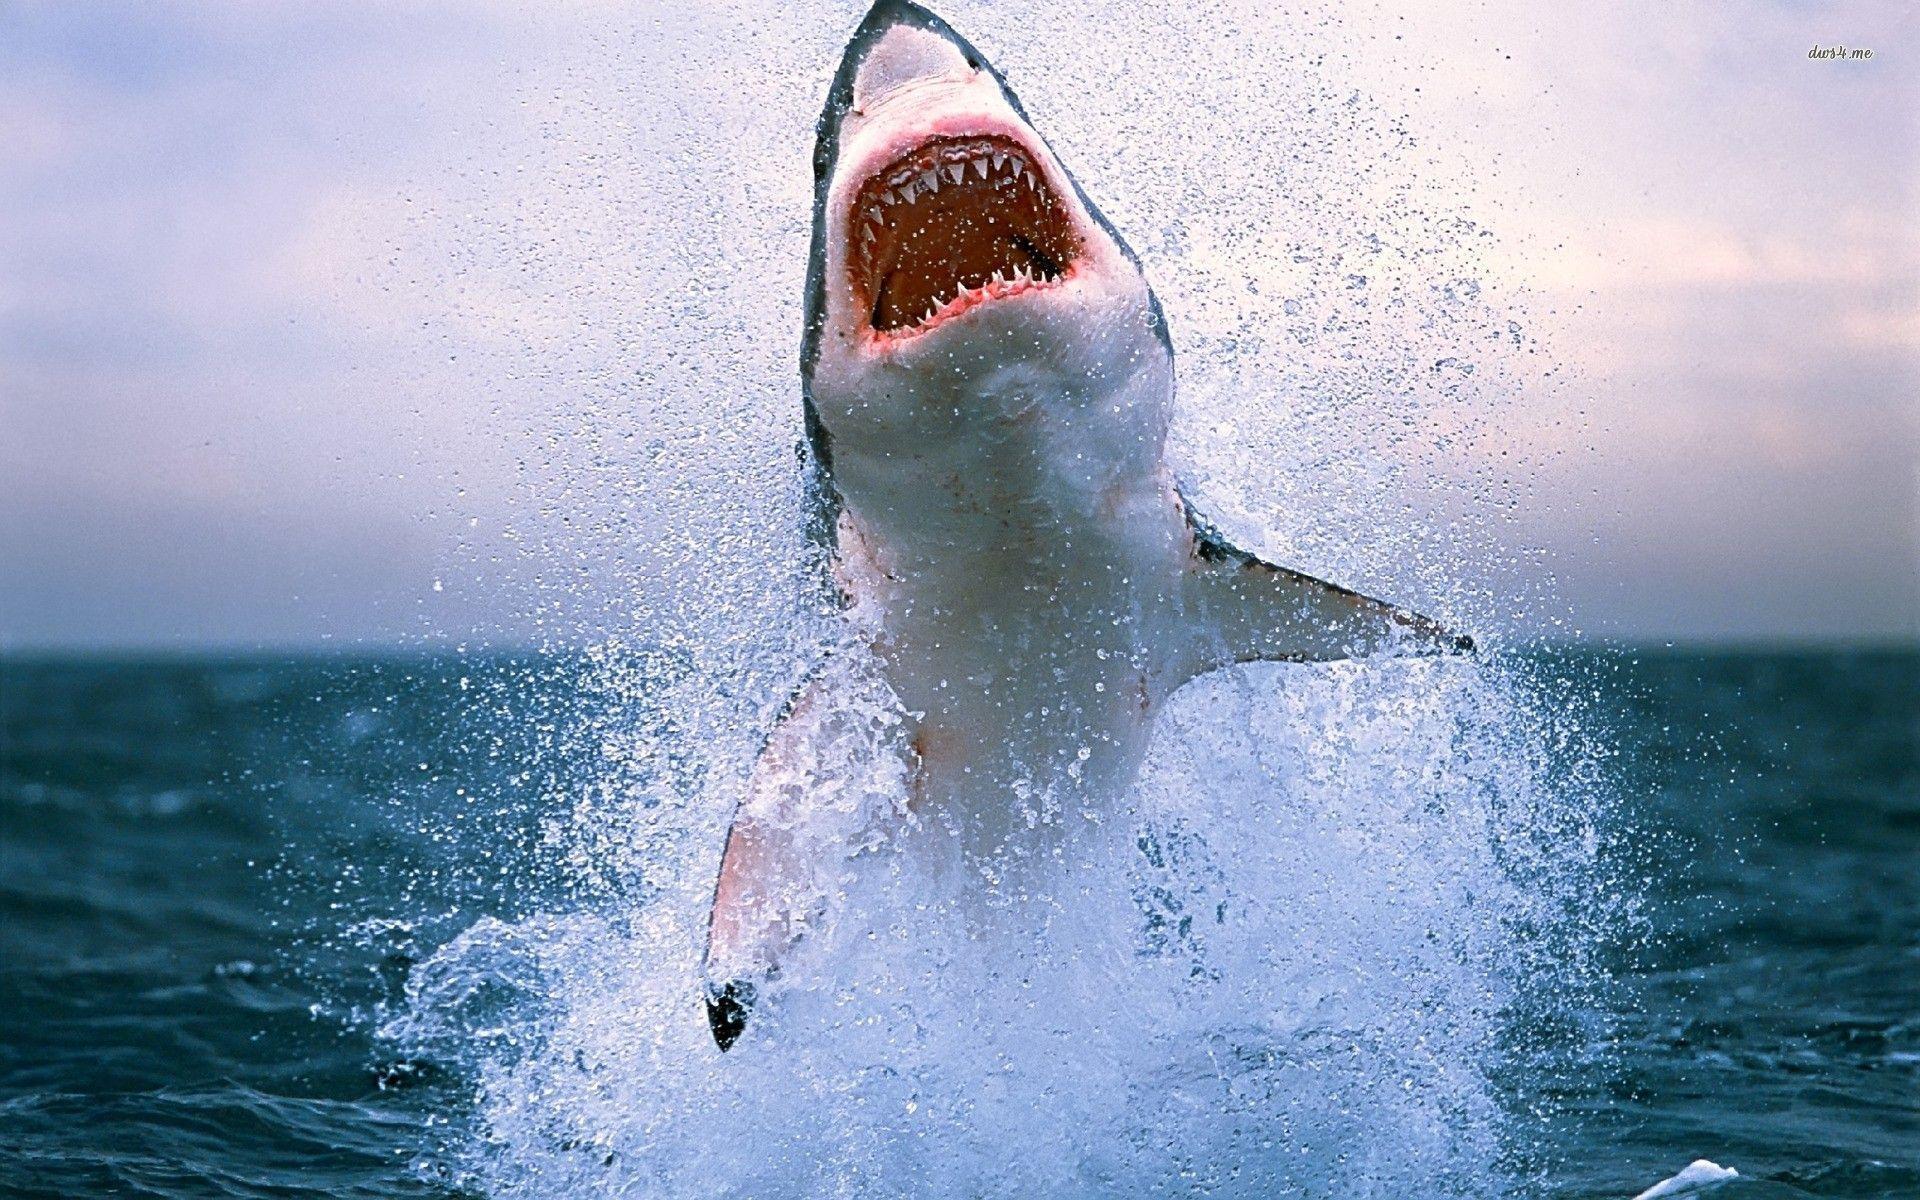 Wallpapers Iphone Artsy Pics In Shark Wallpaper